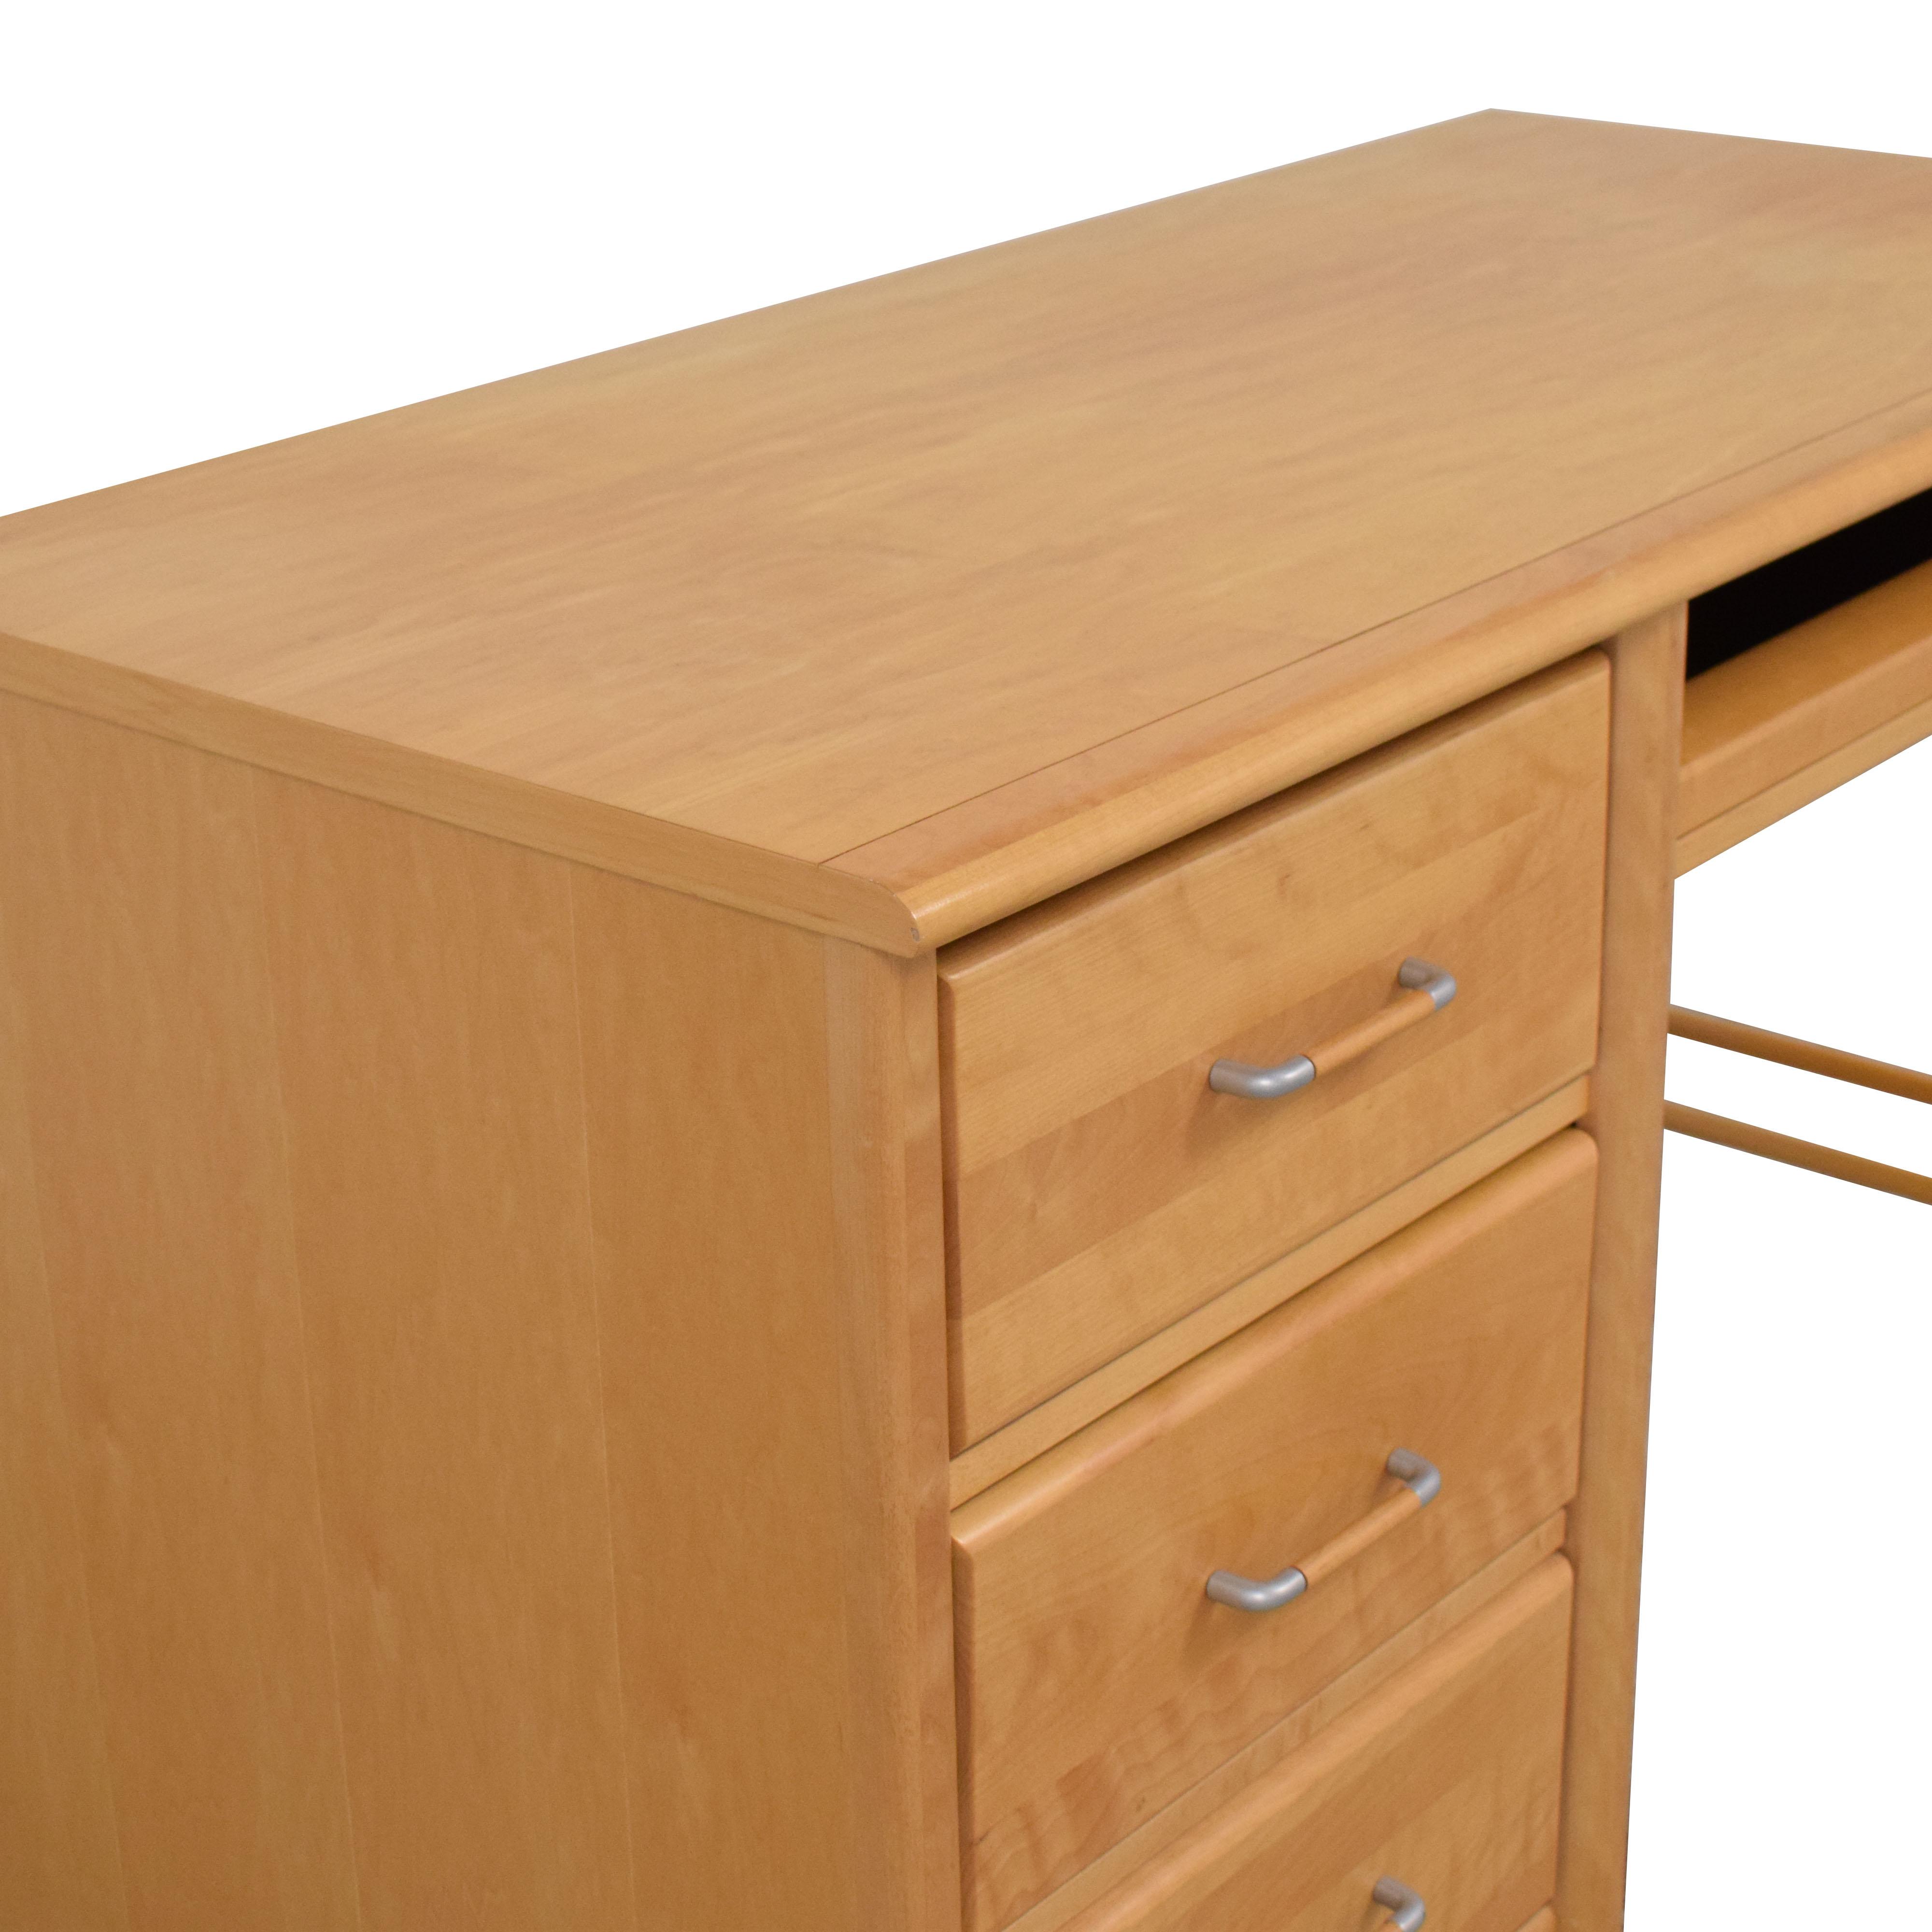 Stanley Furniture Stanley Furniture Desk light brown